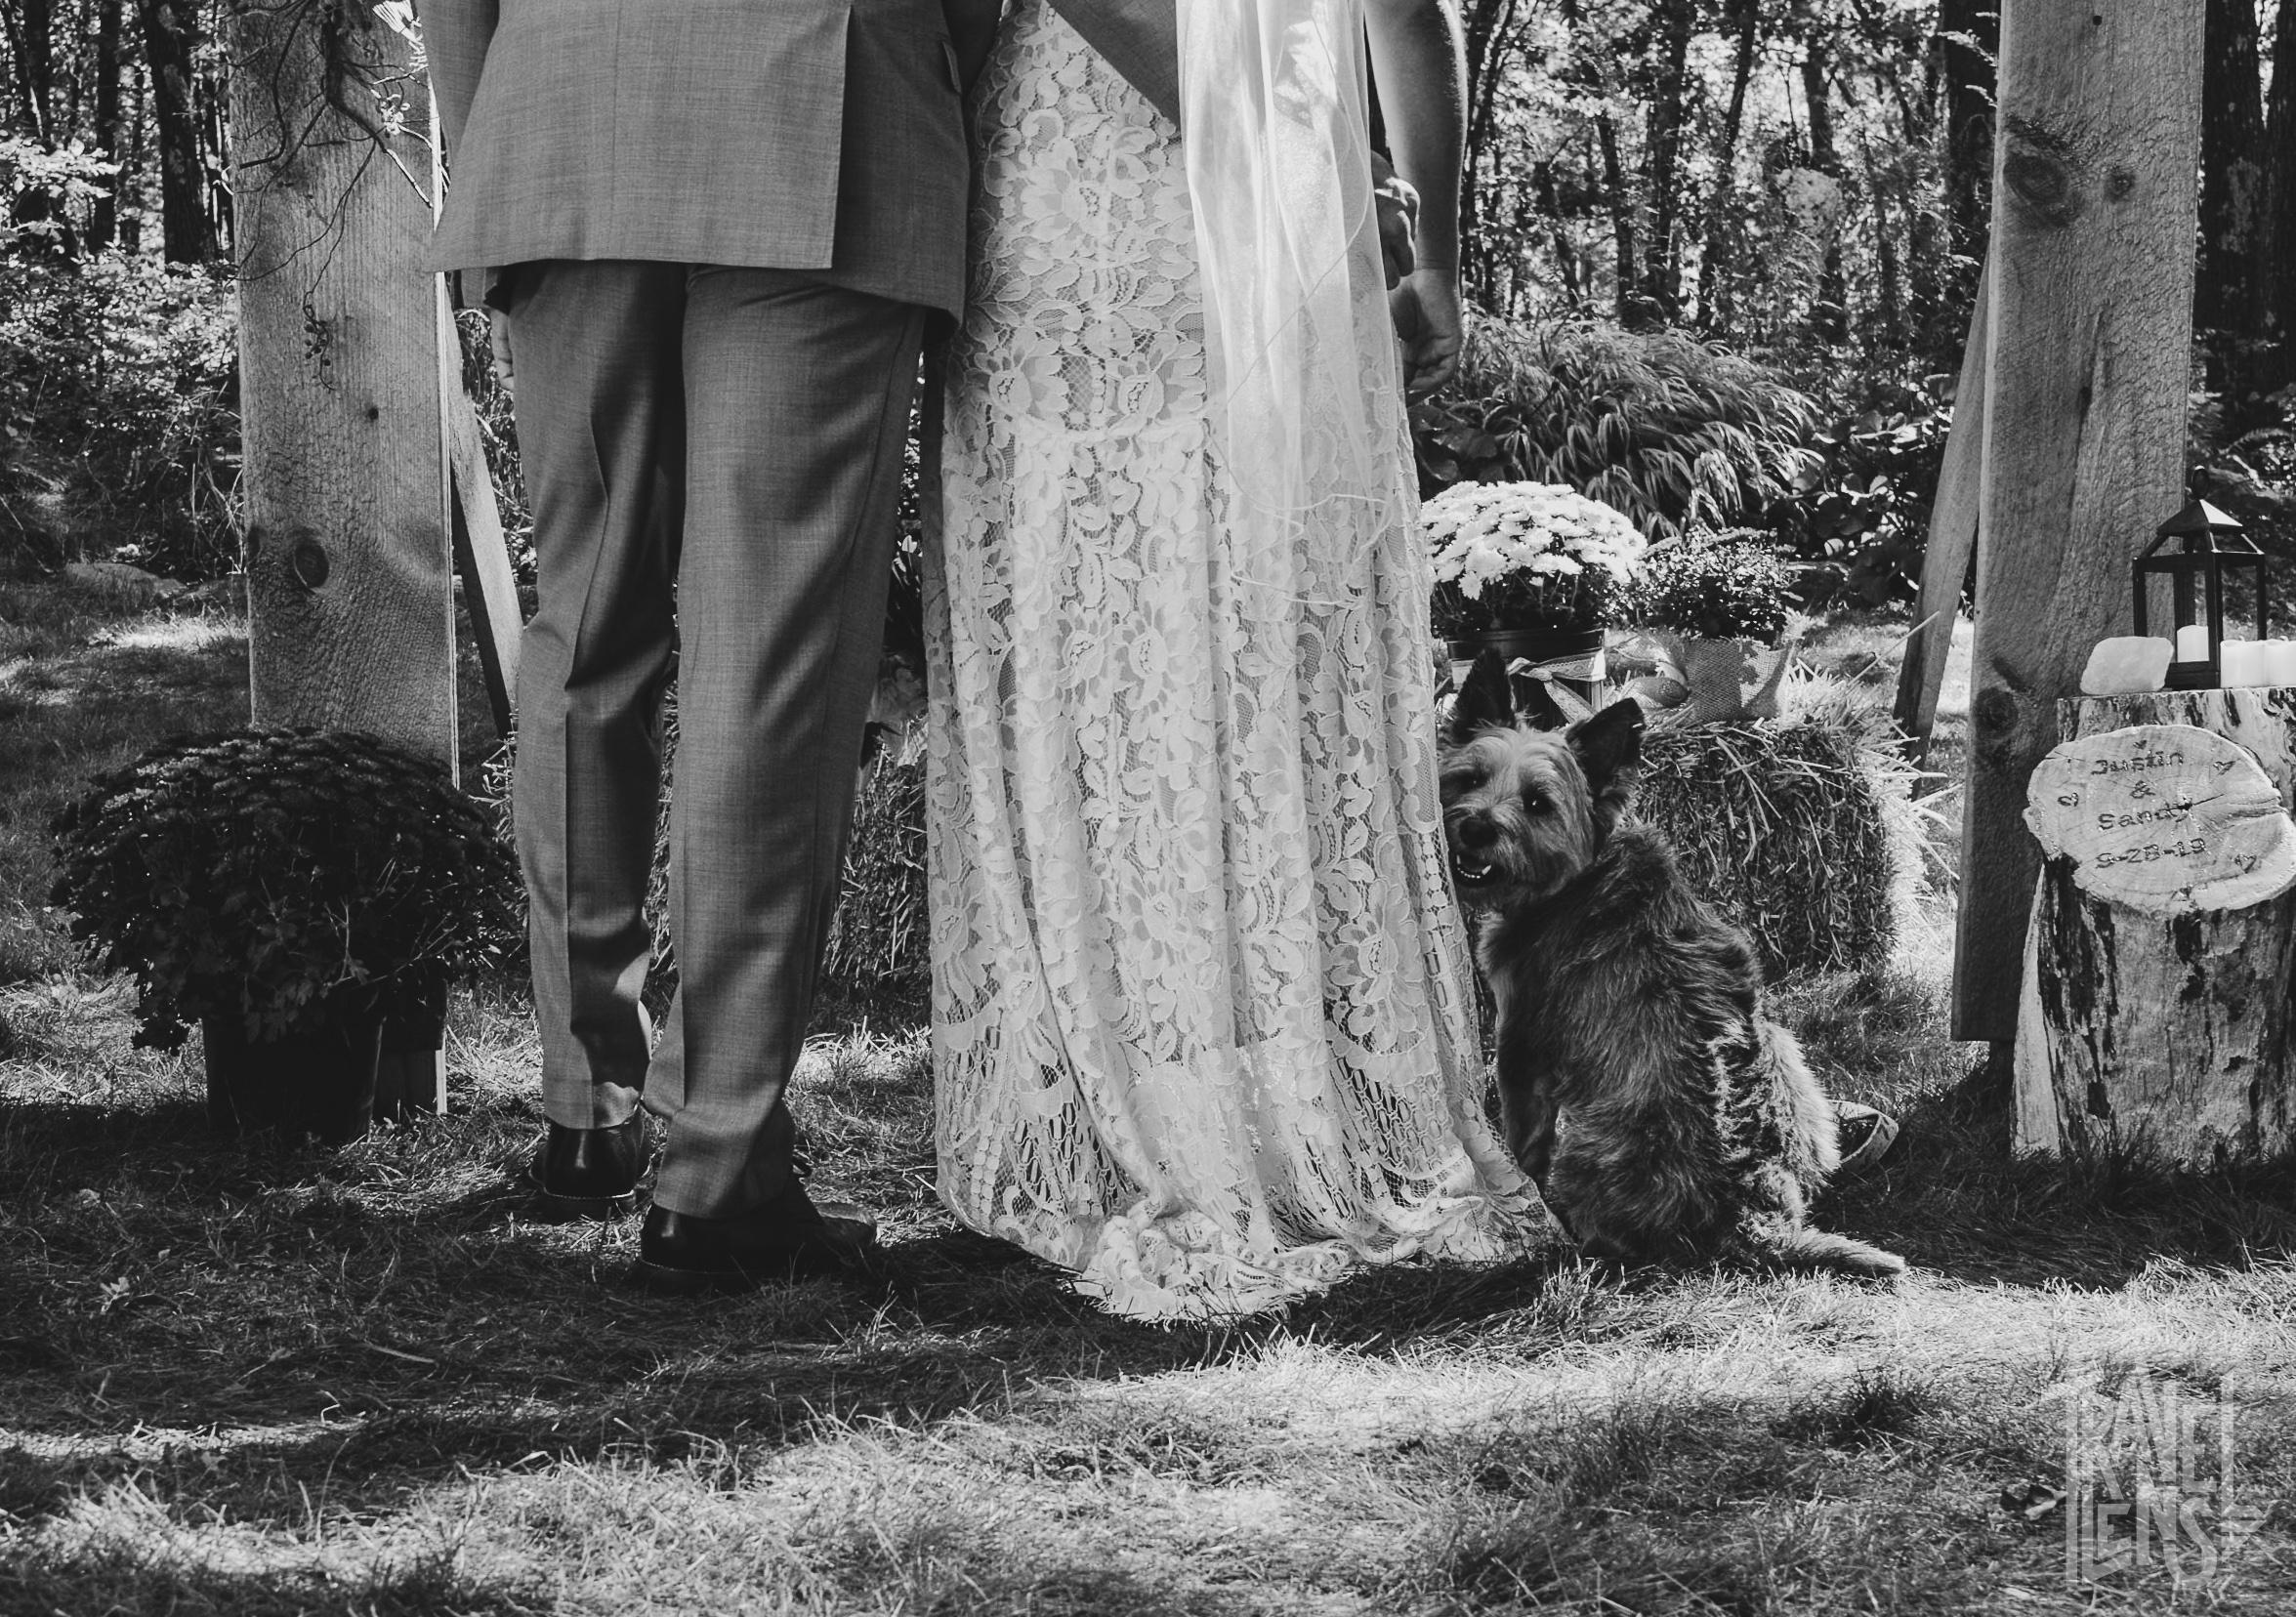 Photos after the wedding